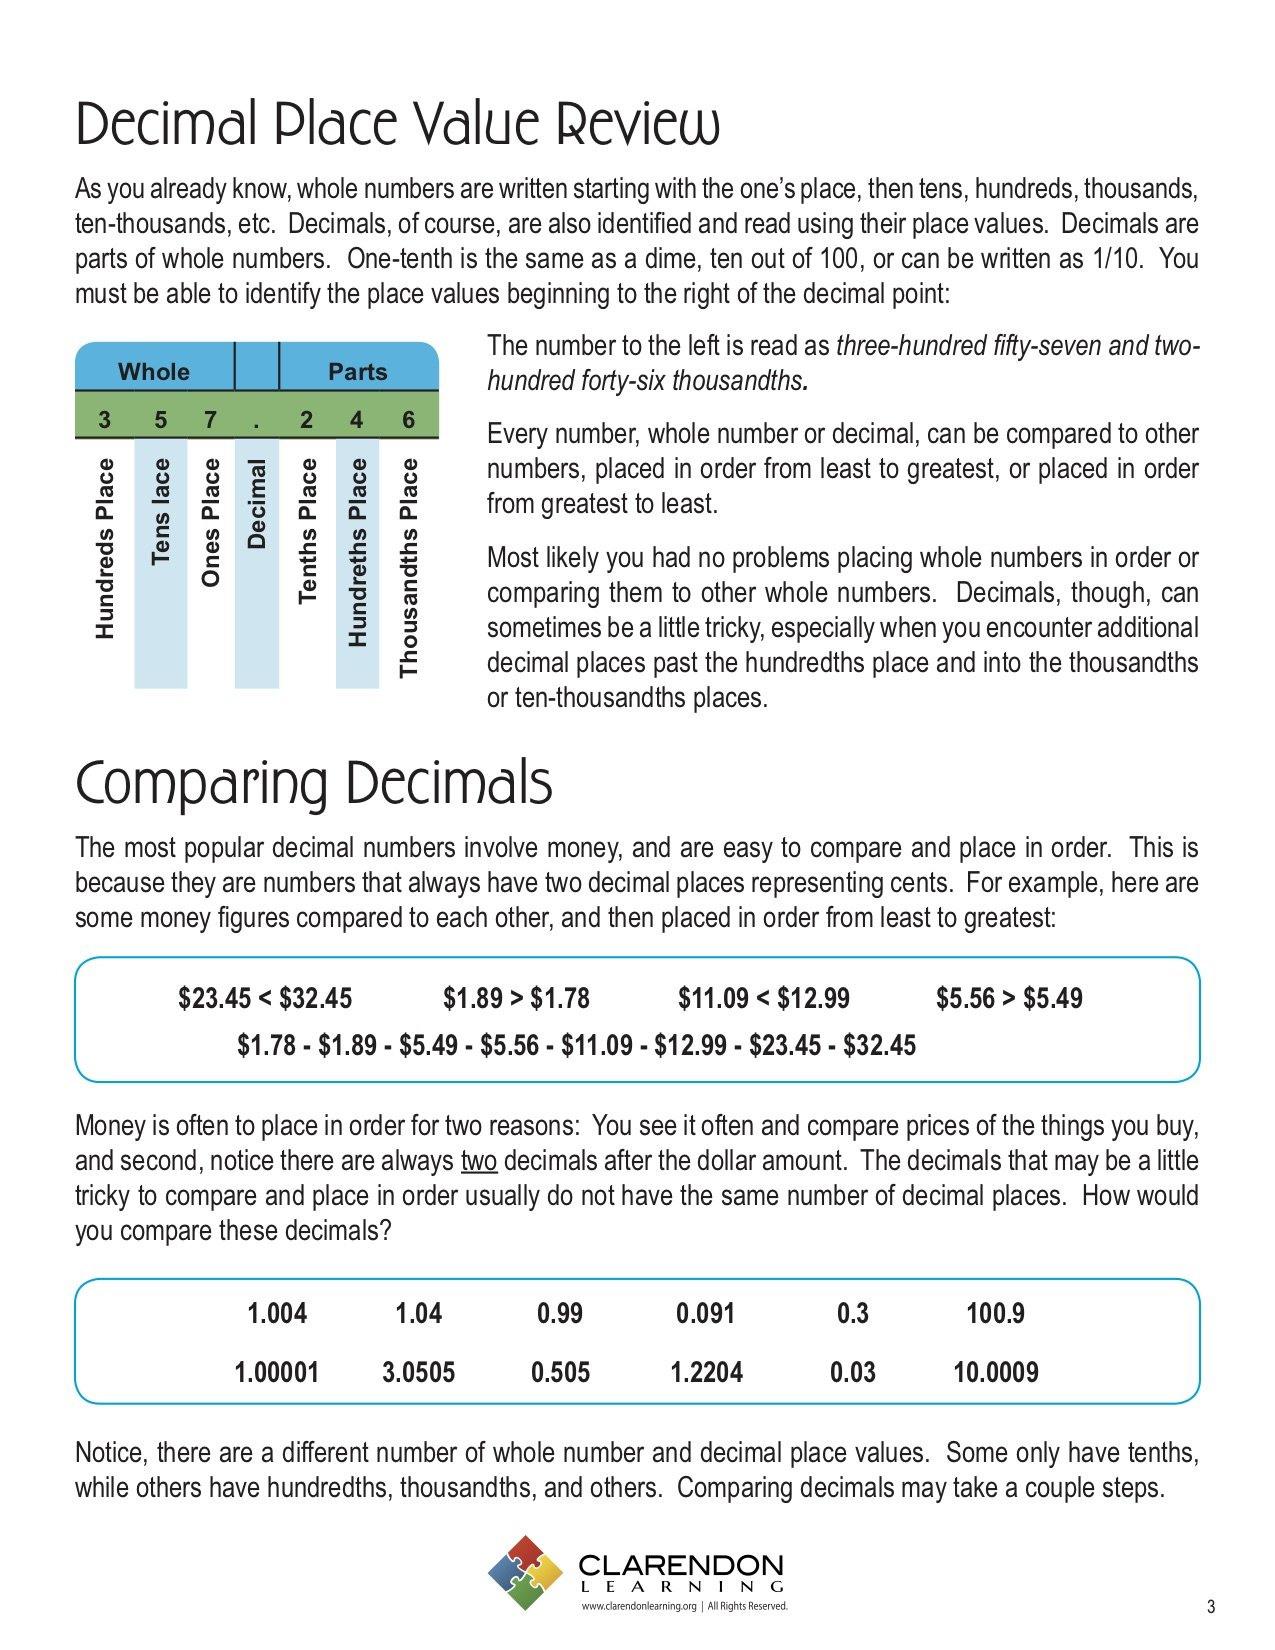 Comparing Decimals Lesson Plan  Clarendon Learning